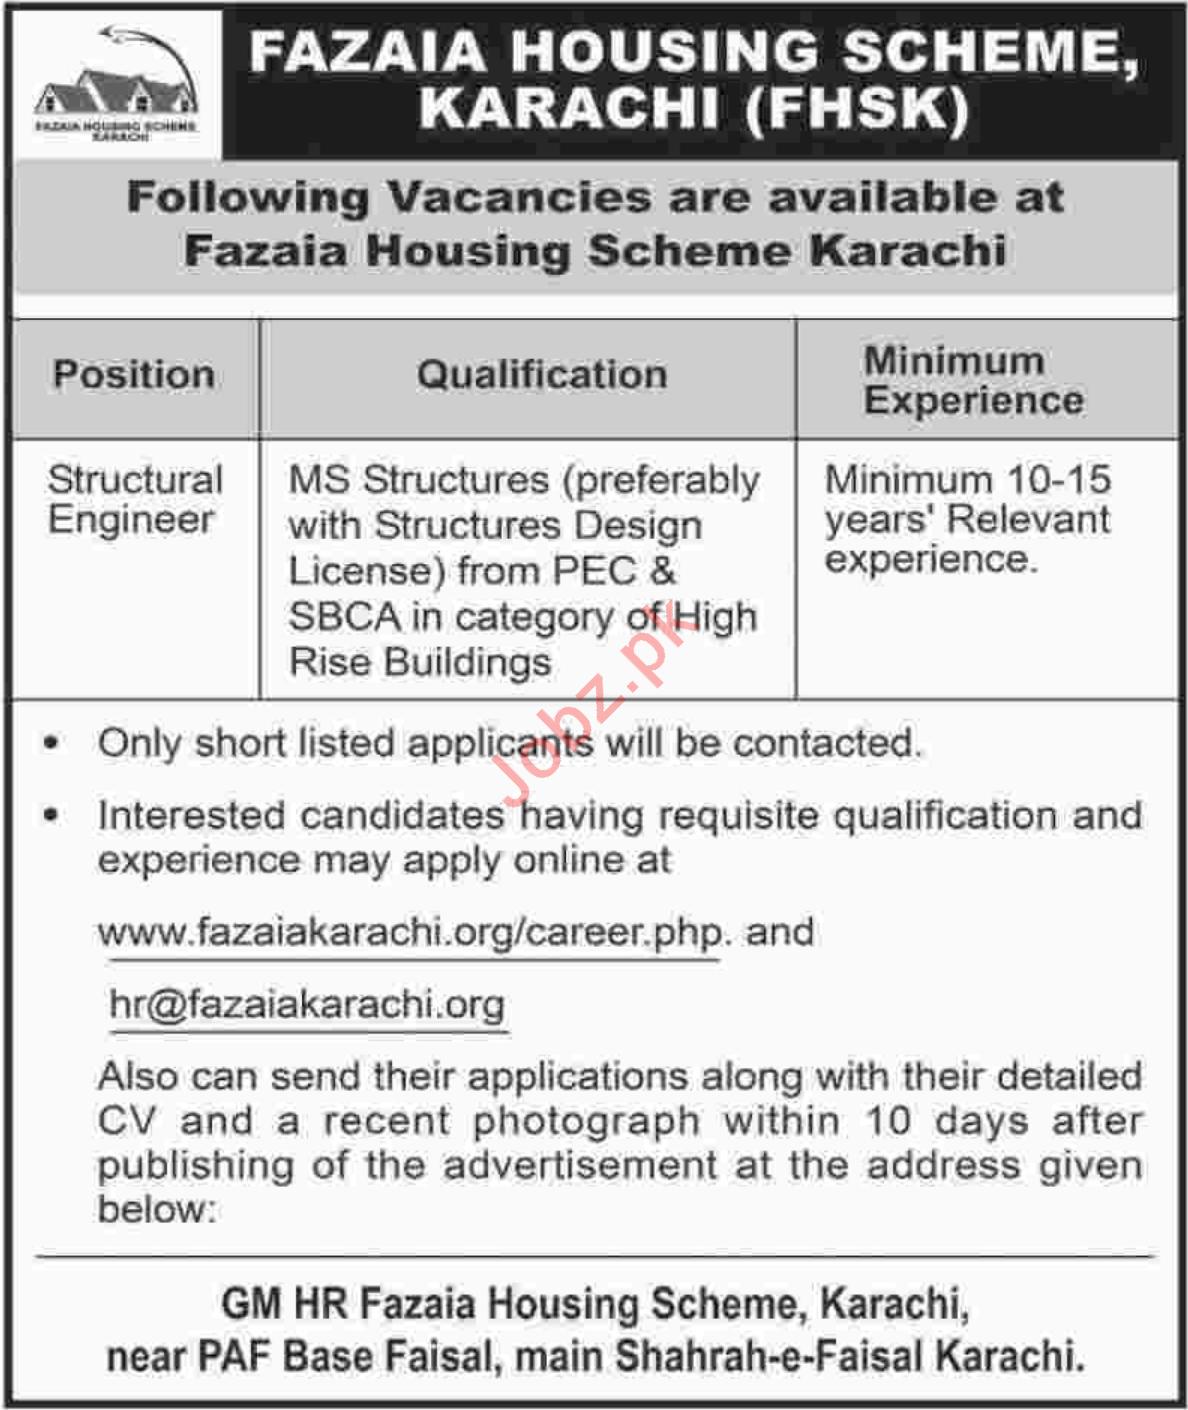 Fazaia Housing Scheme Karachi FHSK Jobs 2018 for Engineers